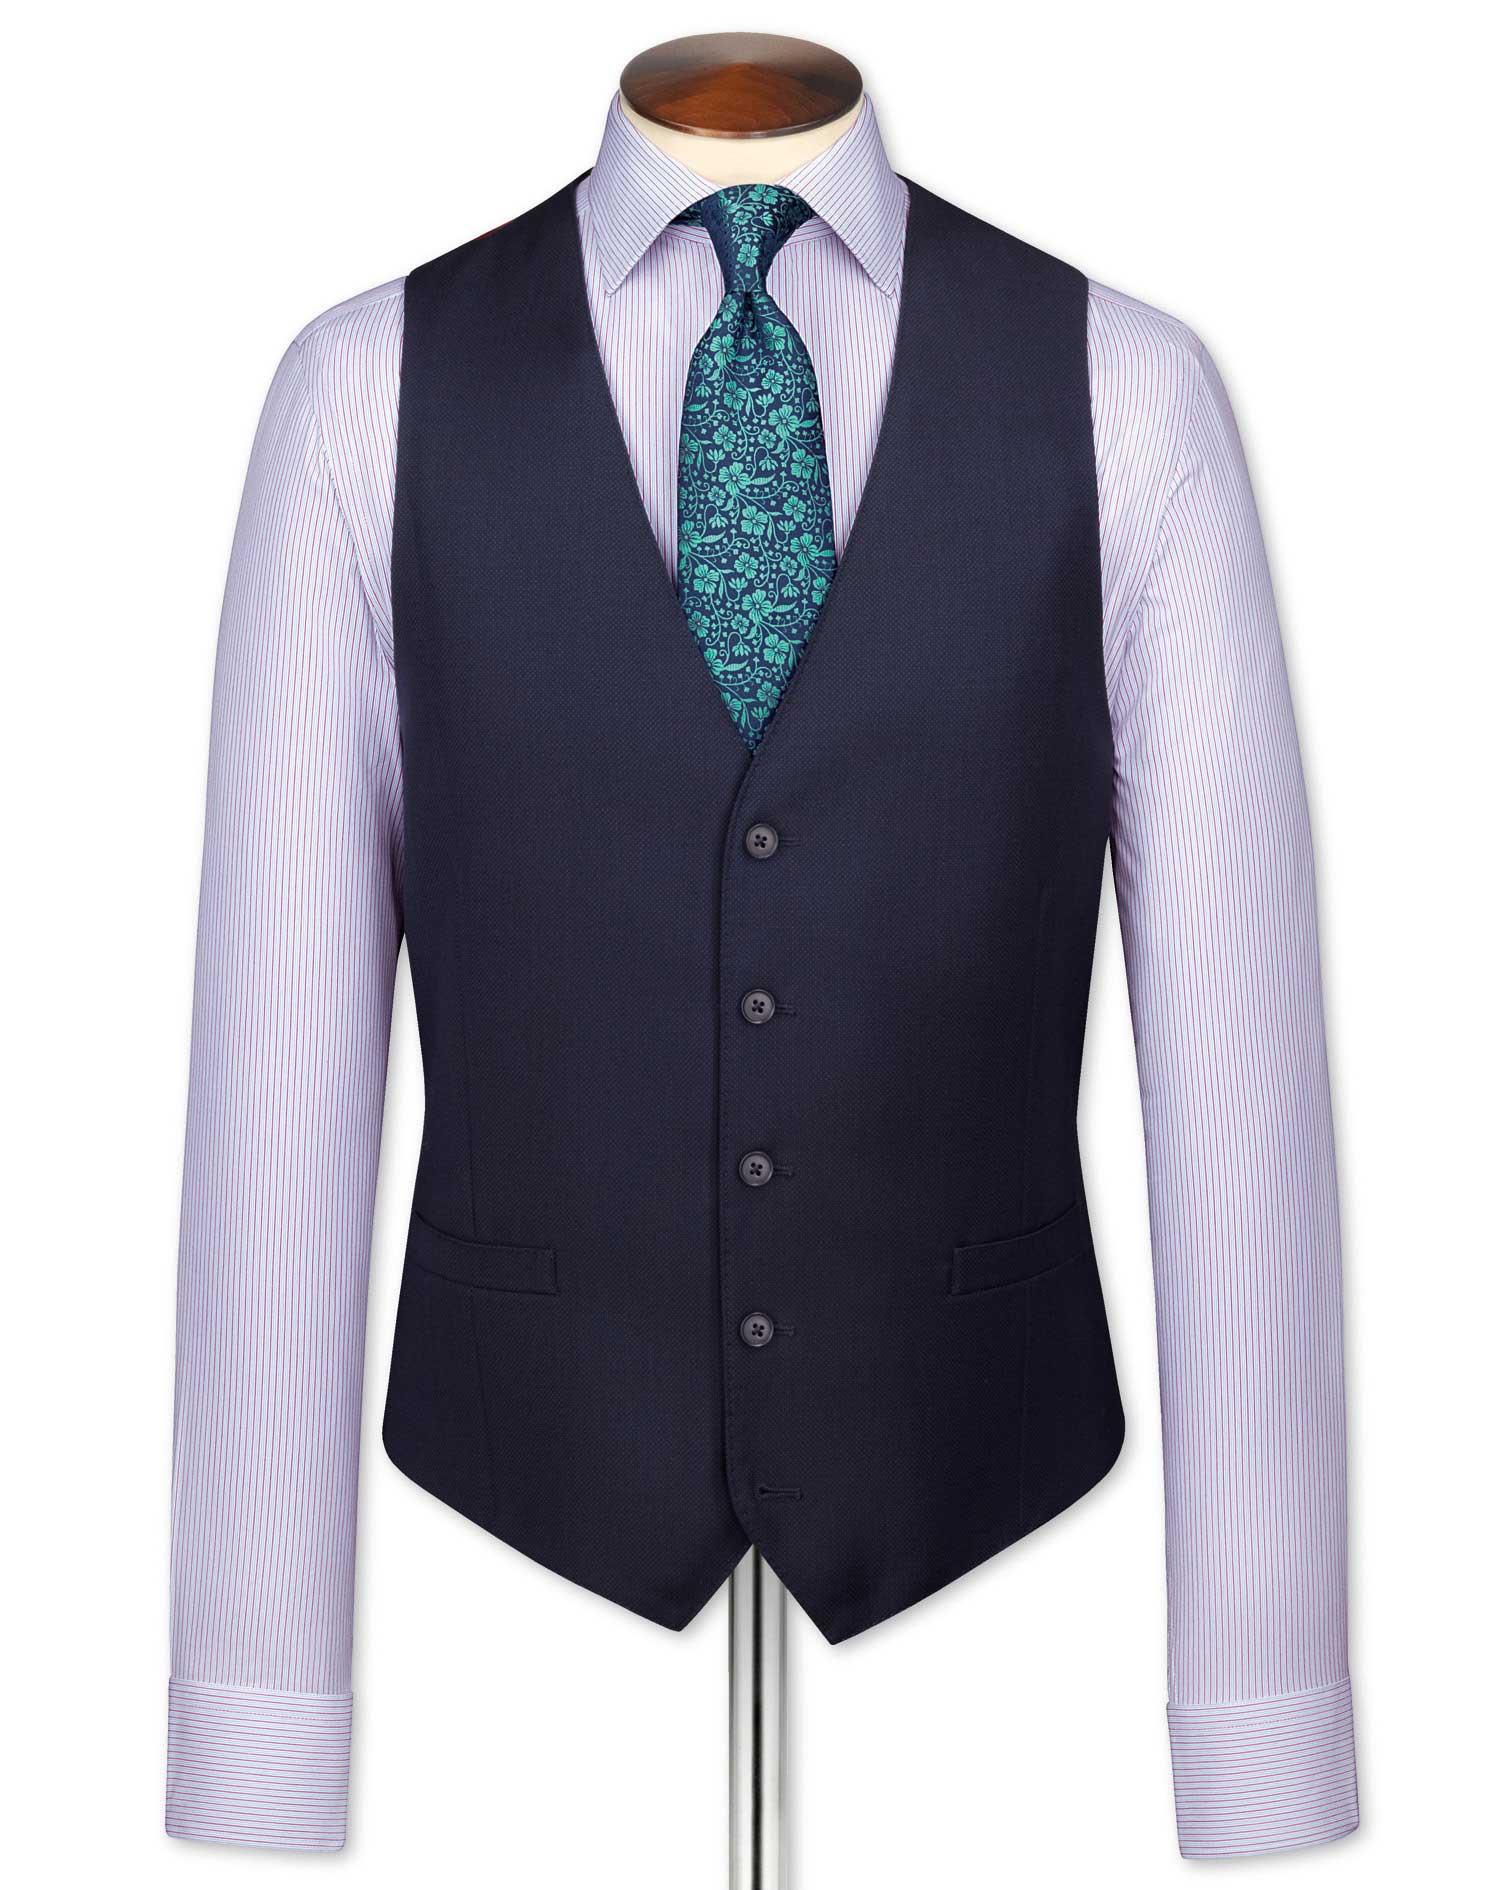 Navy Adjustable Fit Birdseye Travel Suit Wool Waistcoat Size w42 by Charles Tyrwhitt